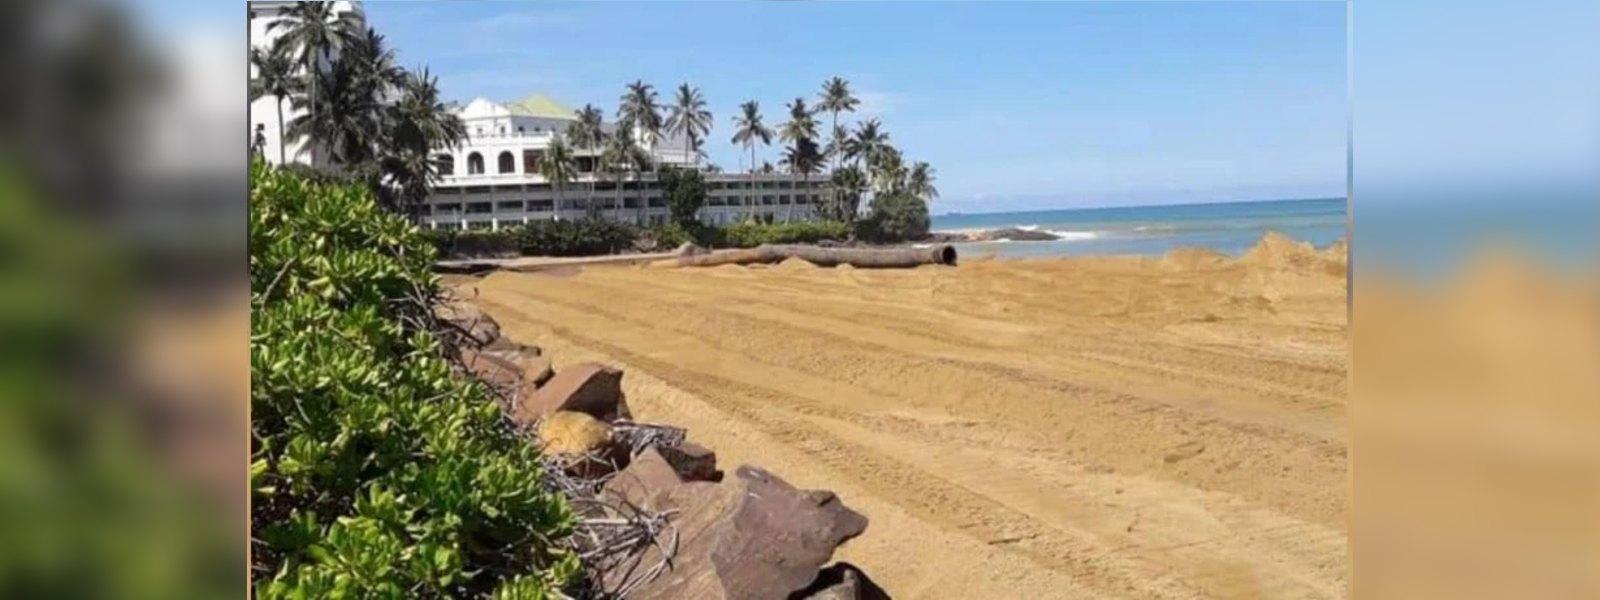 Environmentalists blame authorities over beach nourishment project